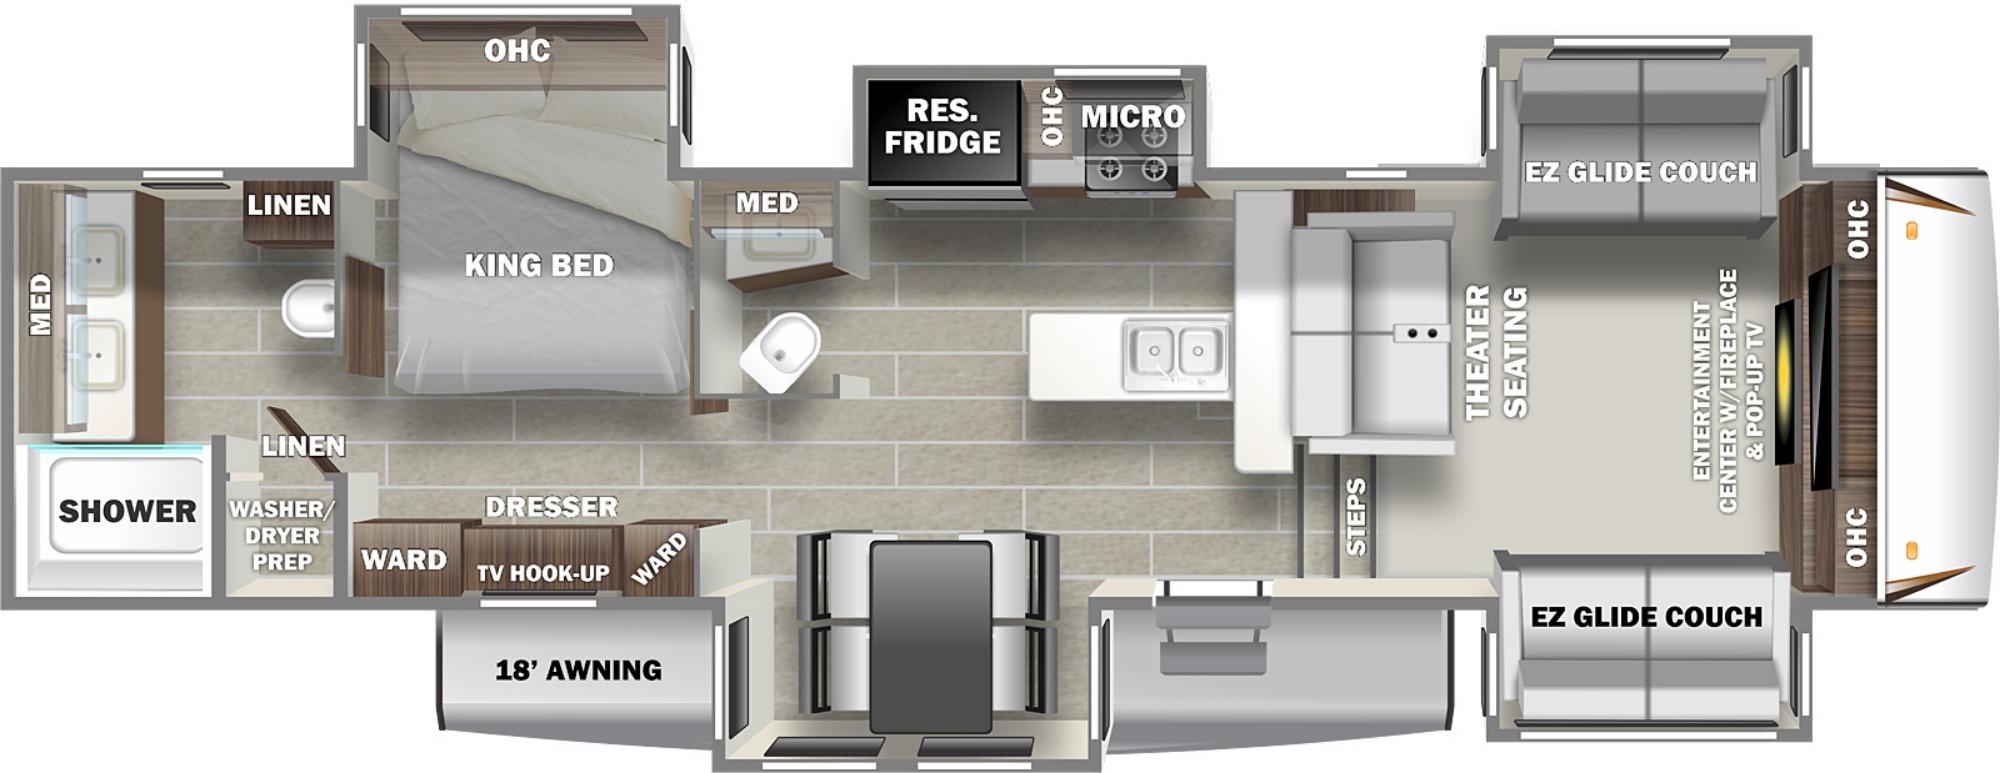 View Floor Plan for 2022 PRIME TIME SANIBEL 3802WB